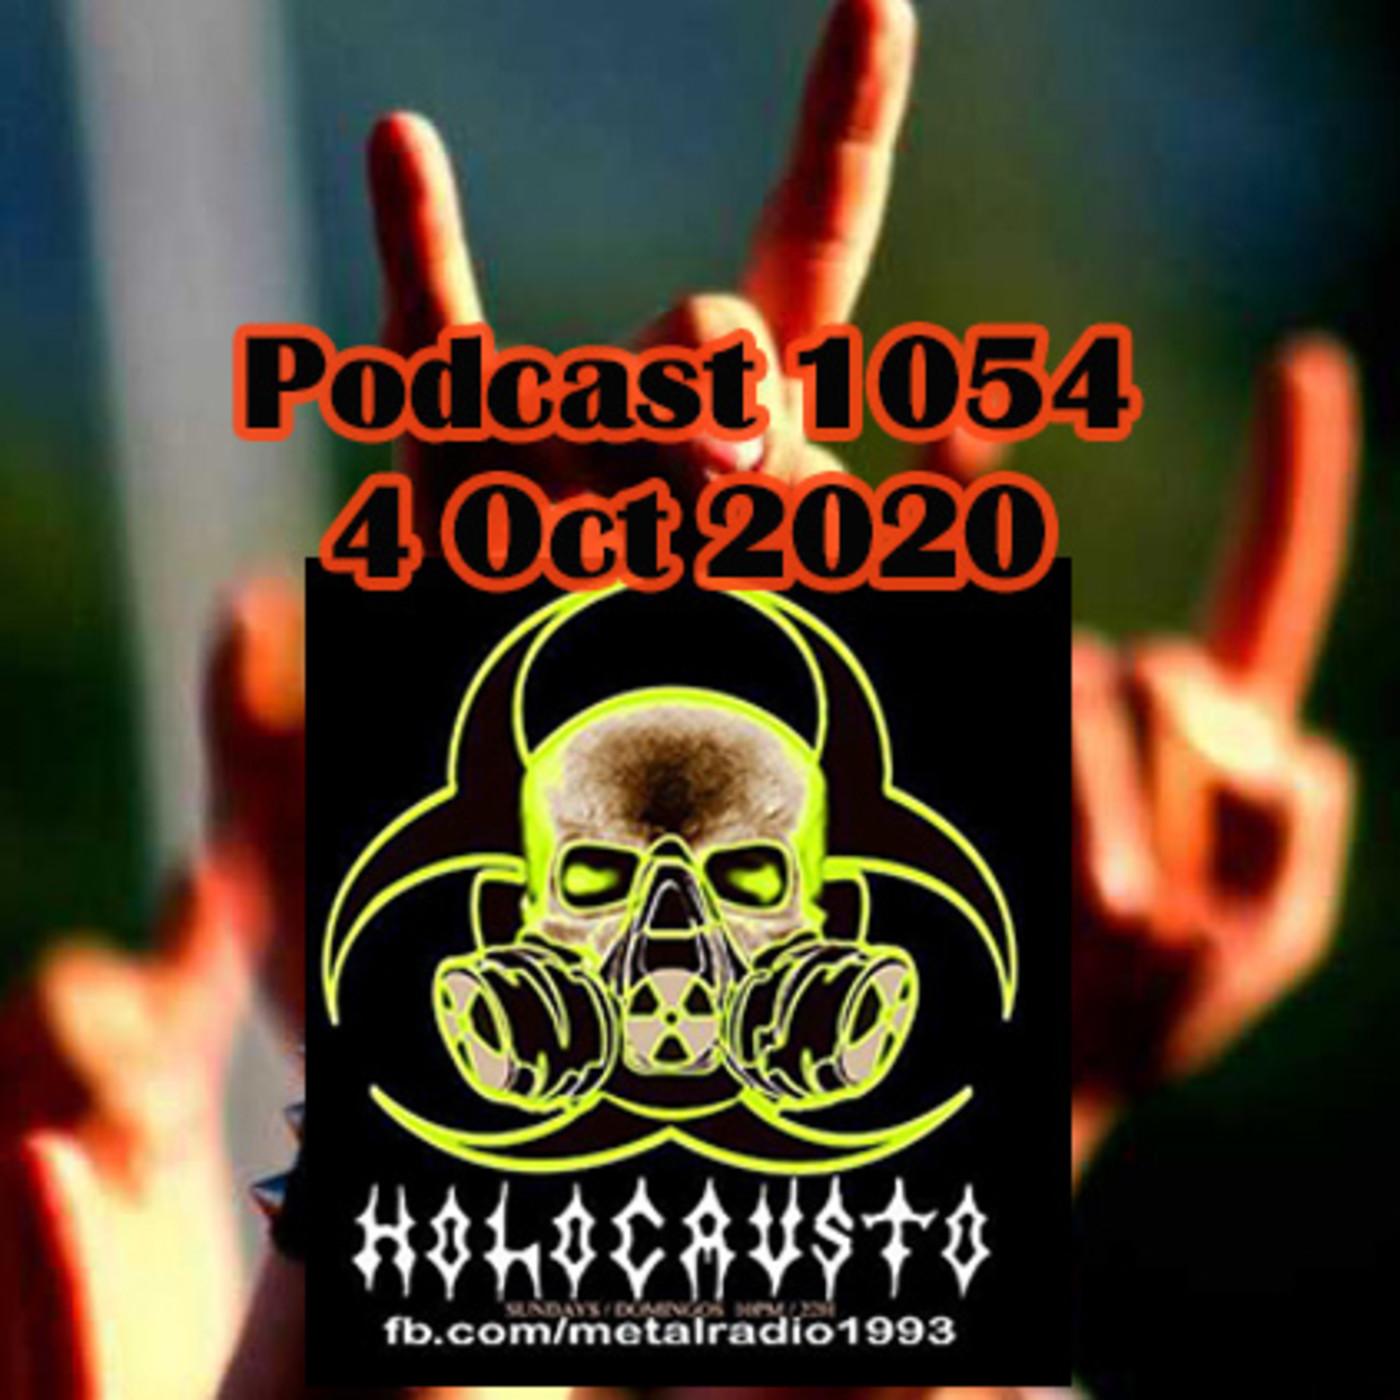 Radio Holocausto - Metal Radioshow Podcast 1054 4 Oct 2020